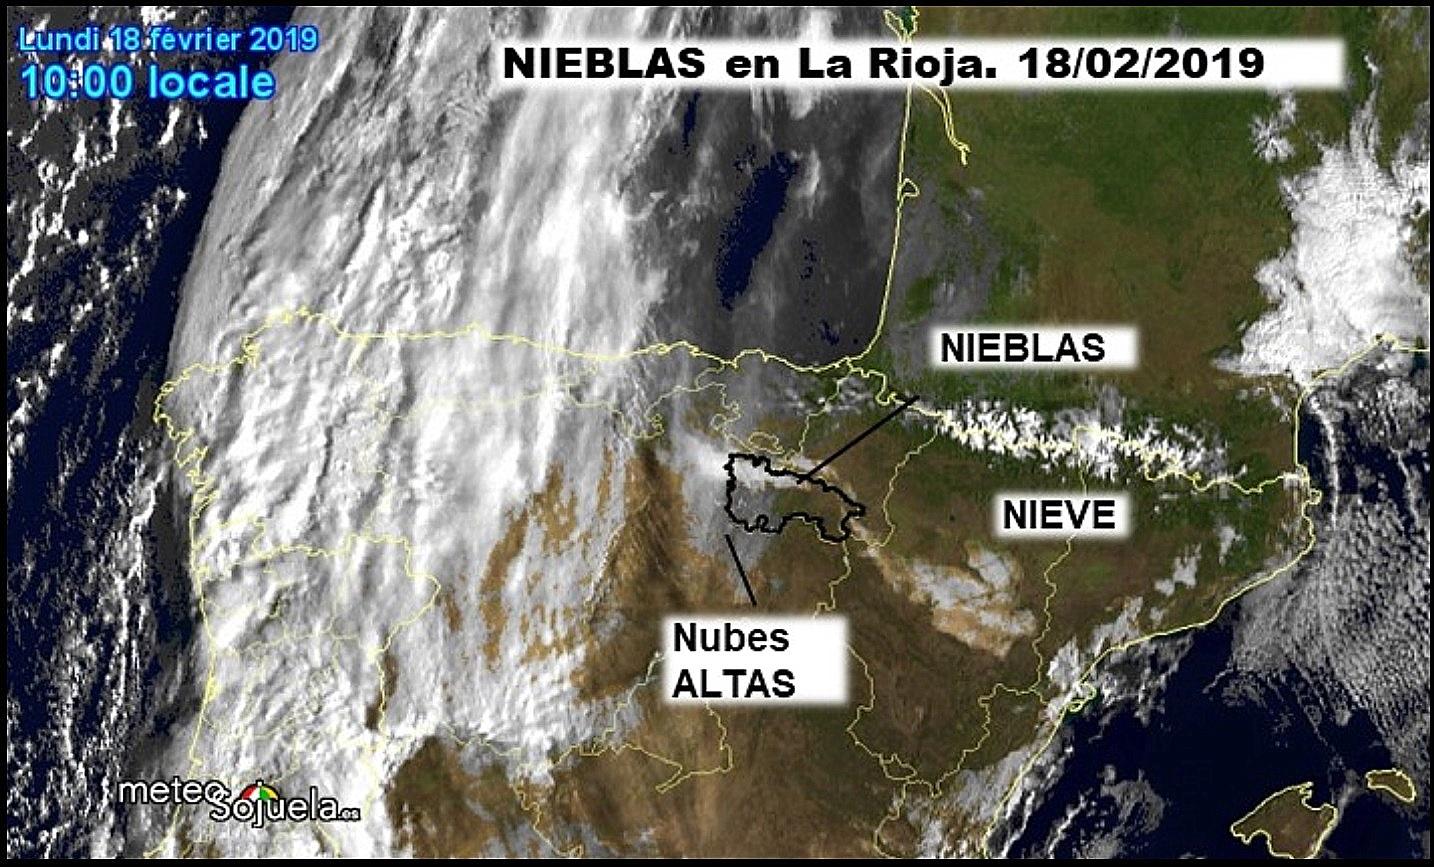 Imágenes de satélite. Nieblas. Meteosojuela